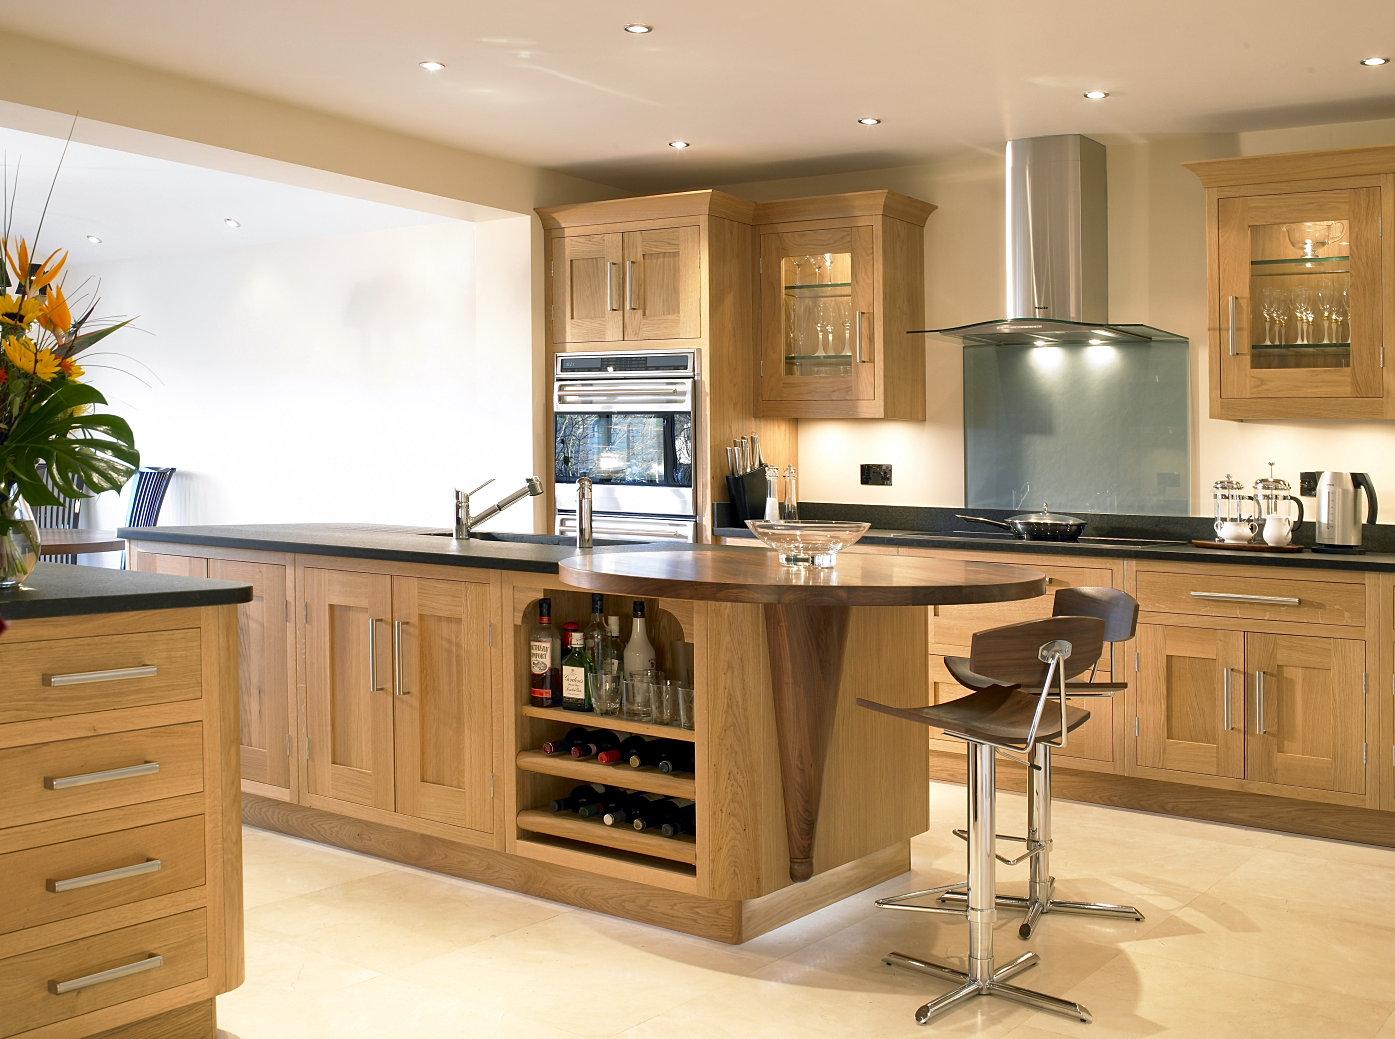 Bespoke Kitchen Designs Uk